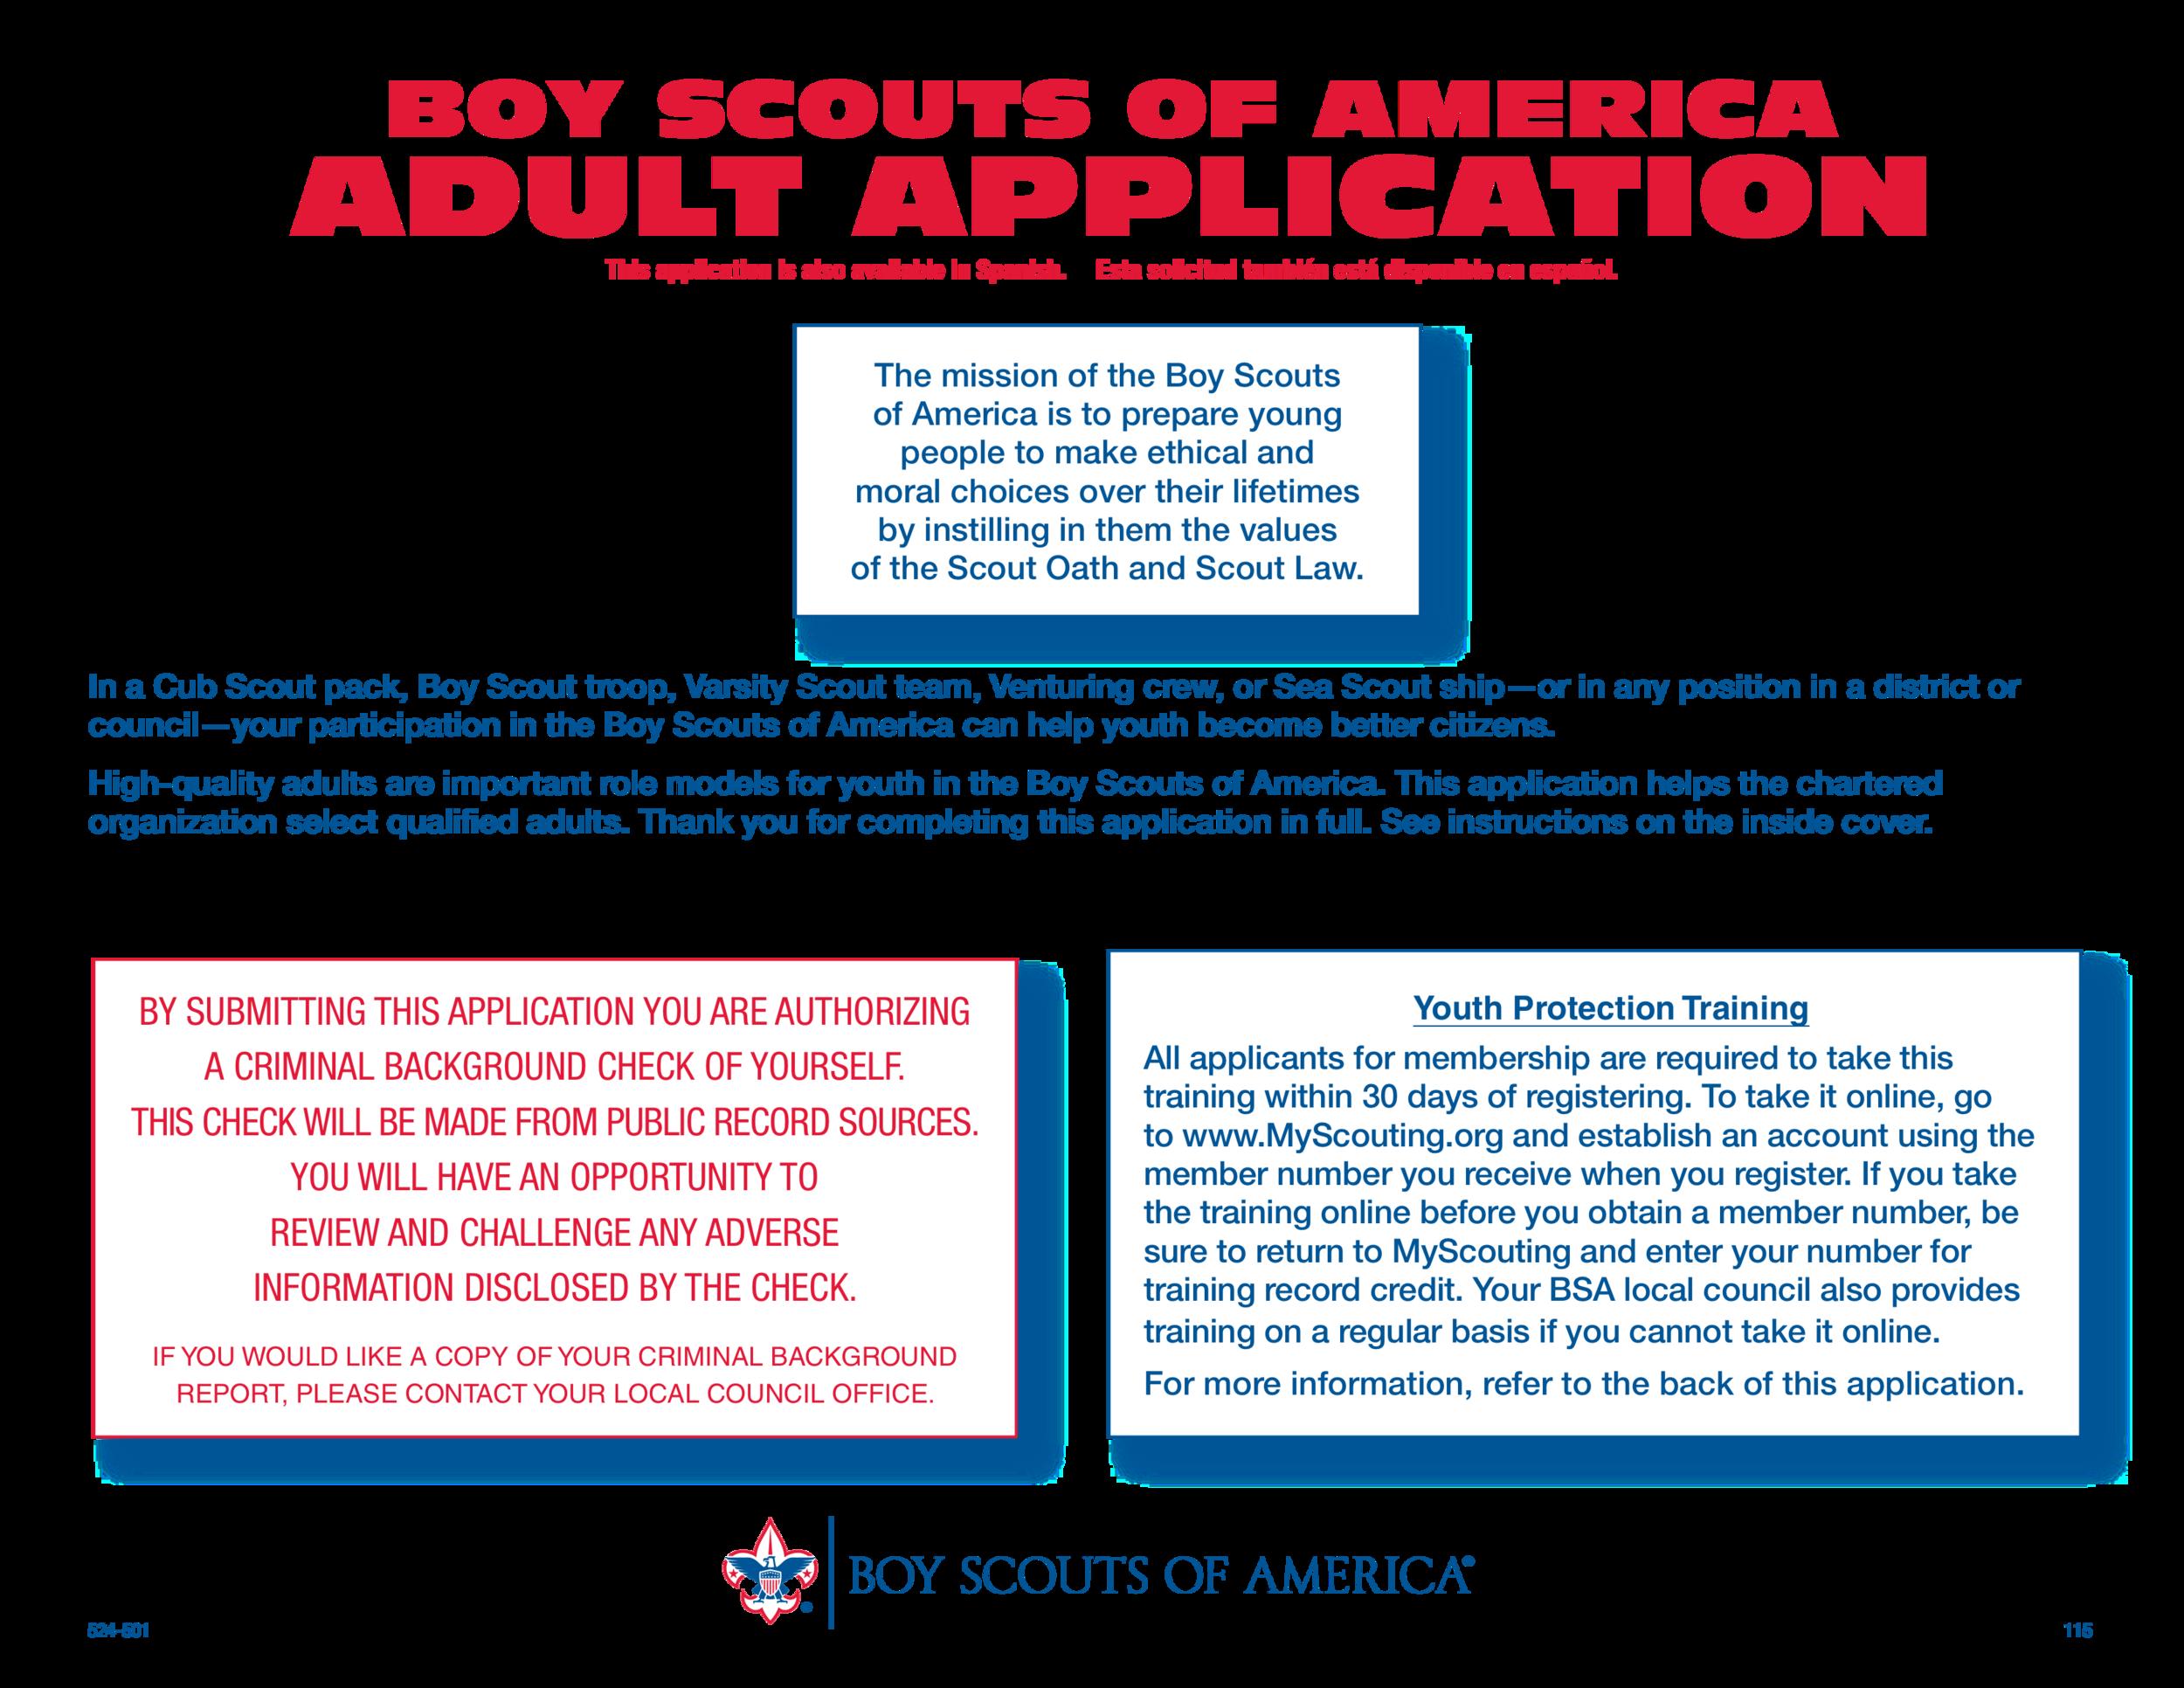 BSA Adult Application524-501.png